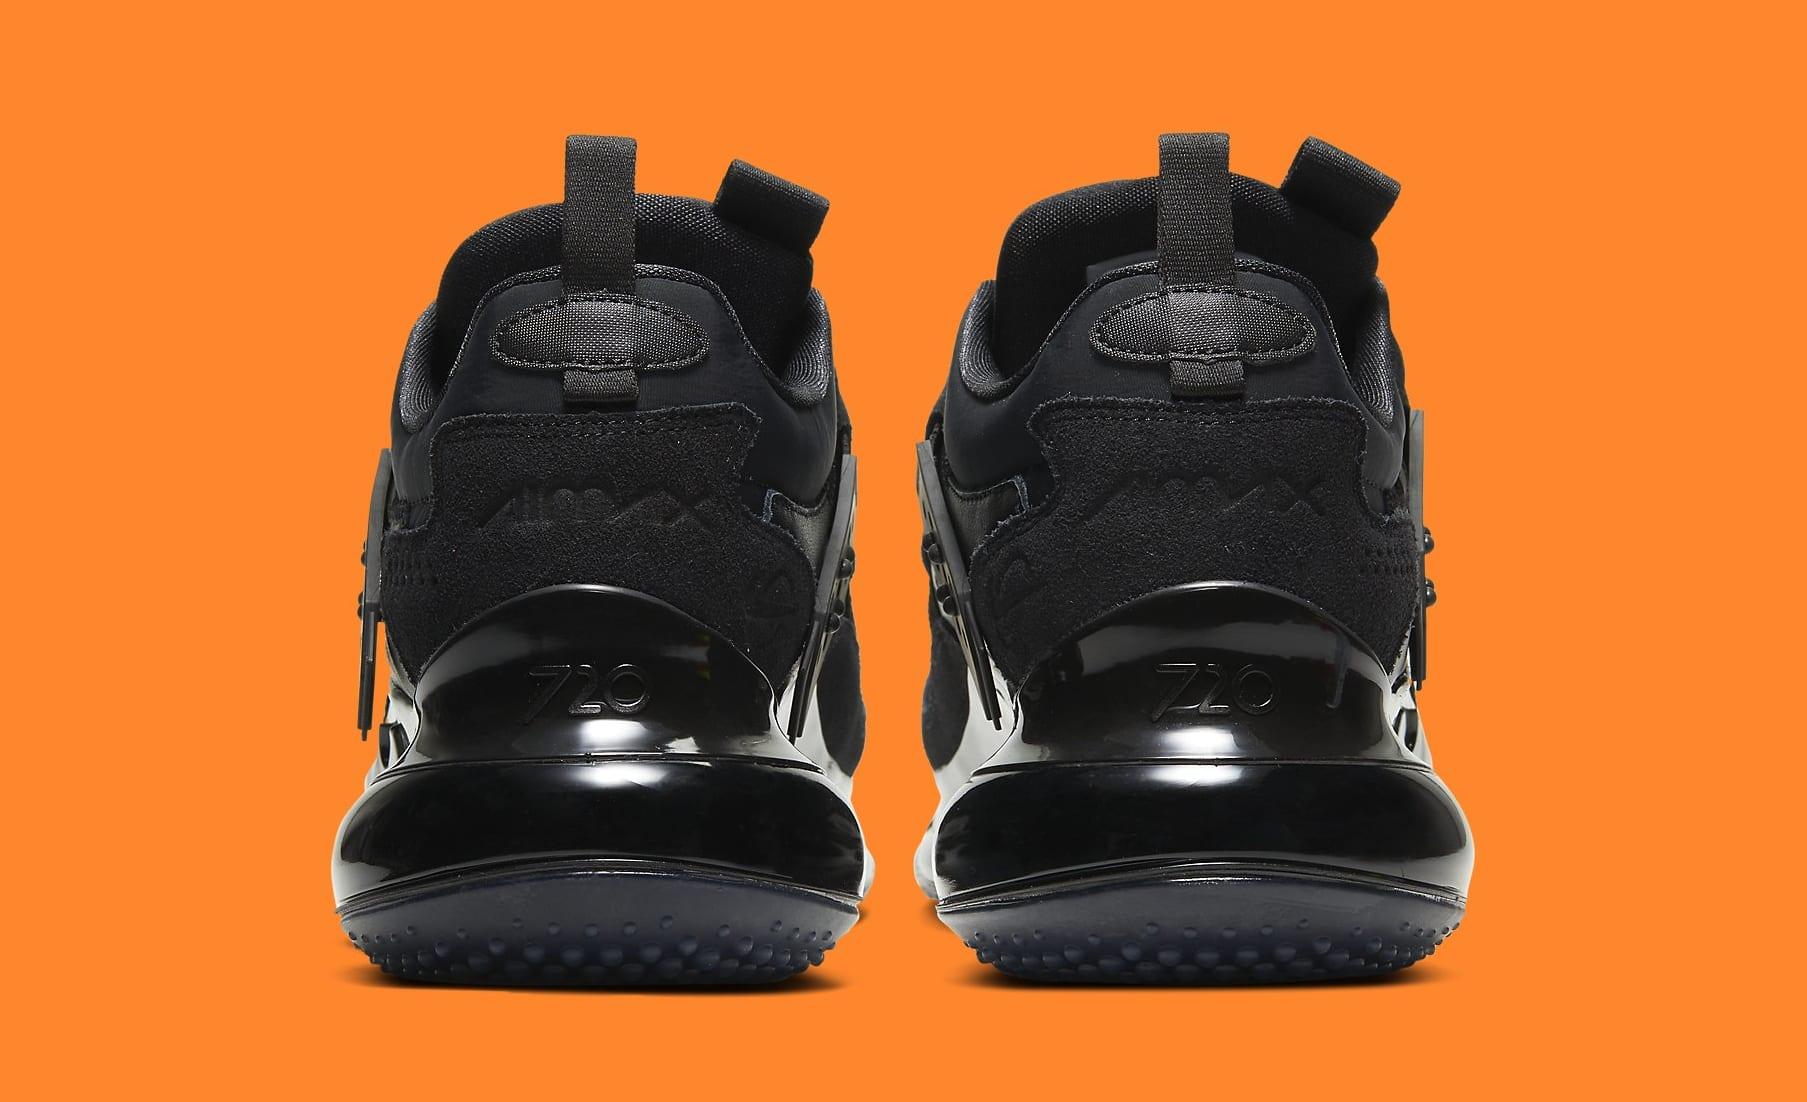 nike-air-max-720-slip-obj-black-dq4155-001-heel